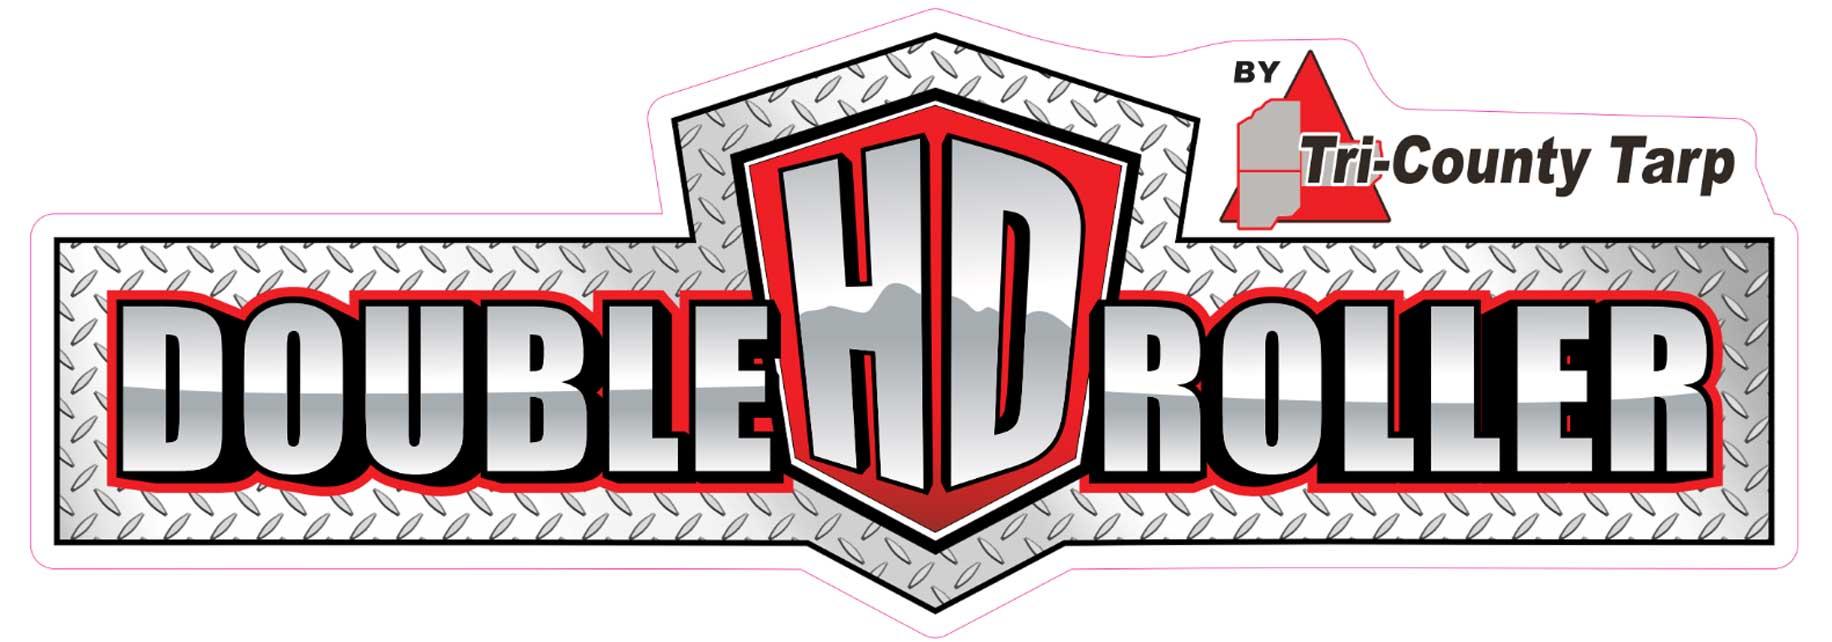 HD Double Roller